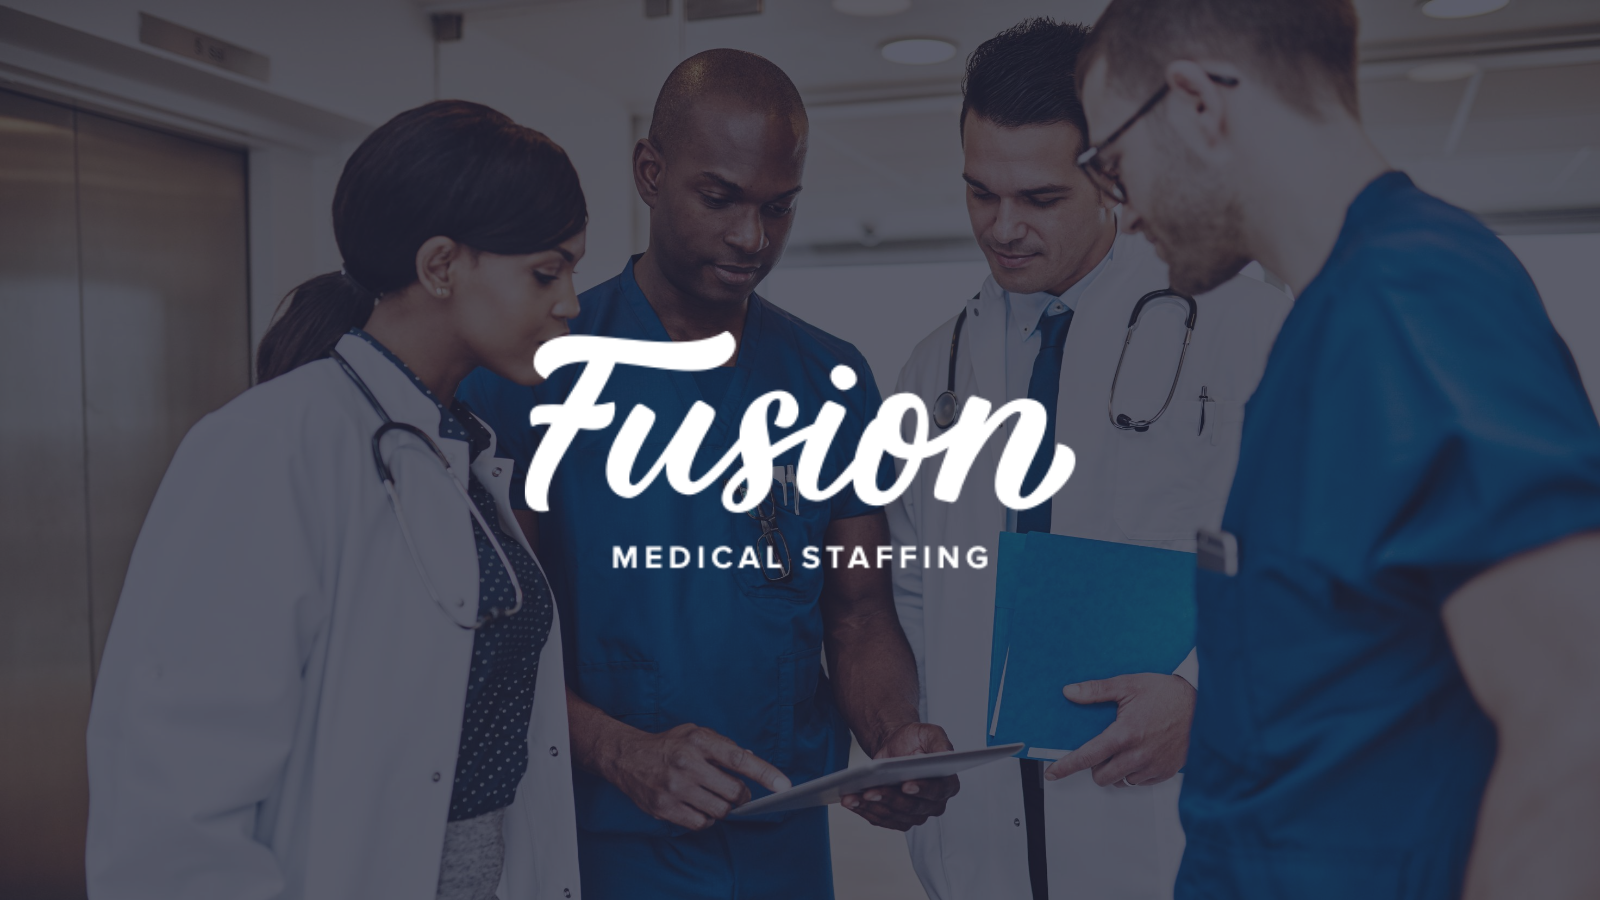 Resource-Case Study - Fusion